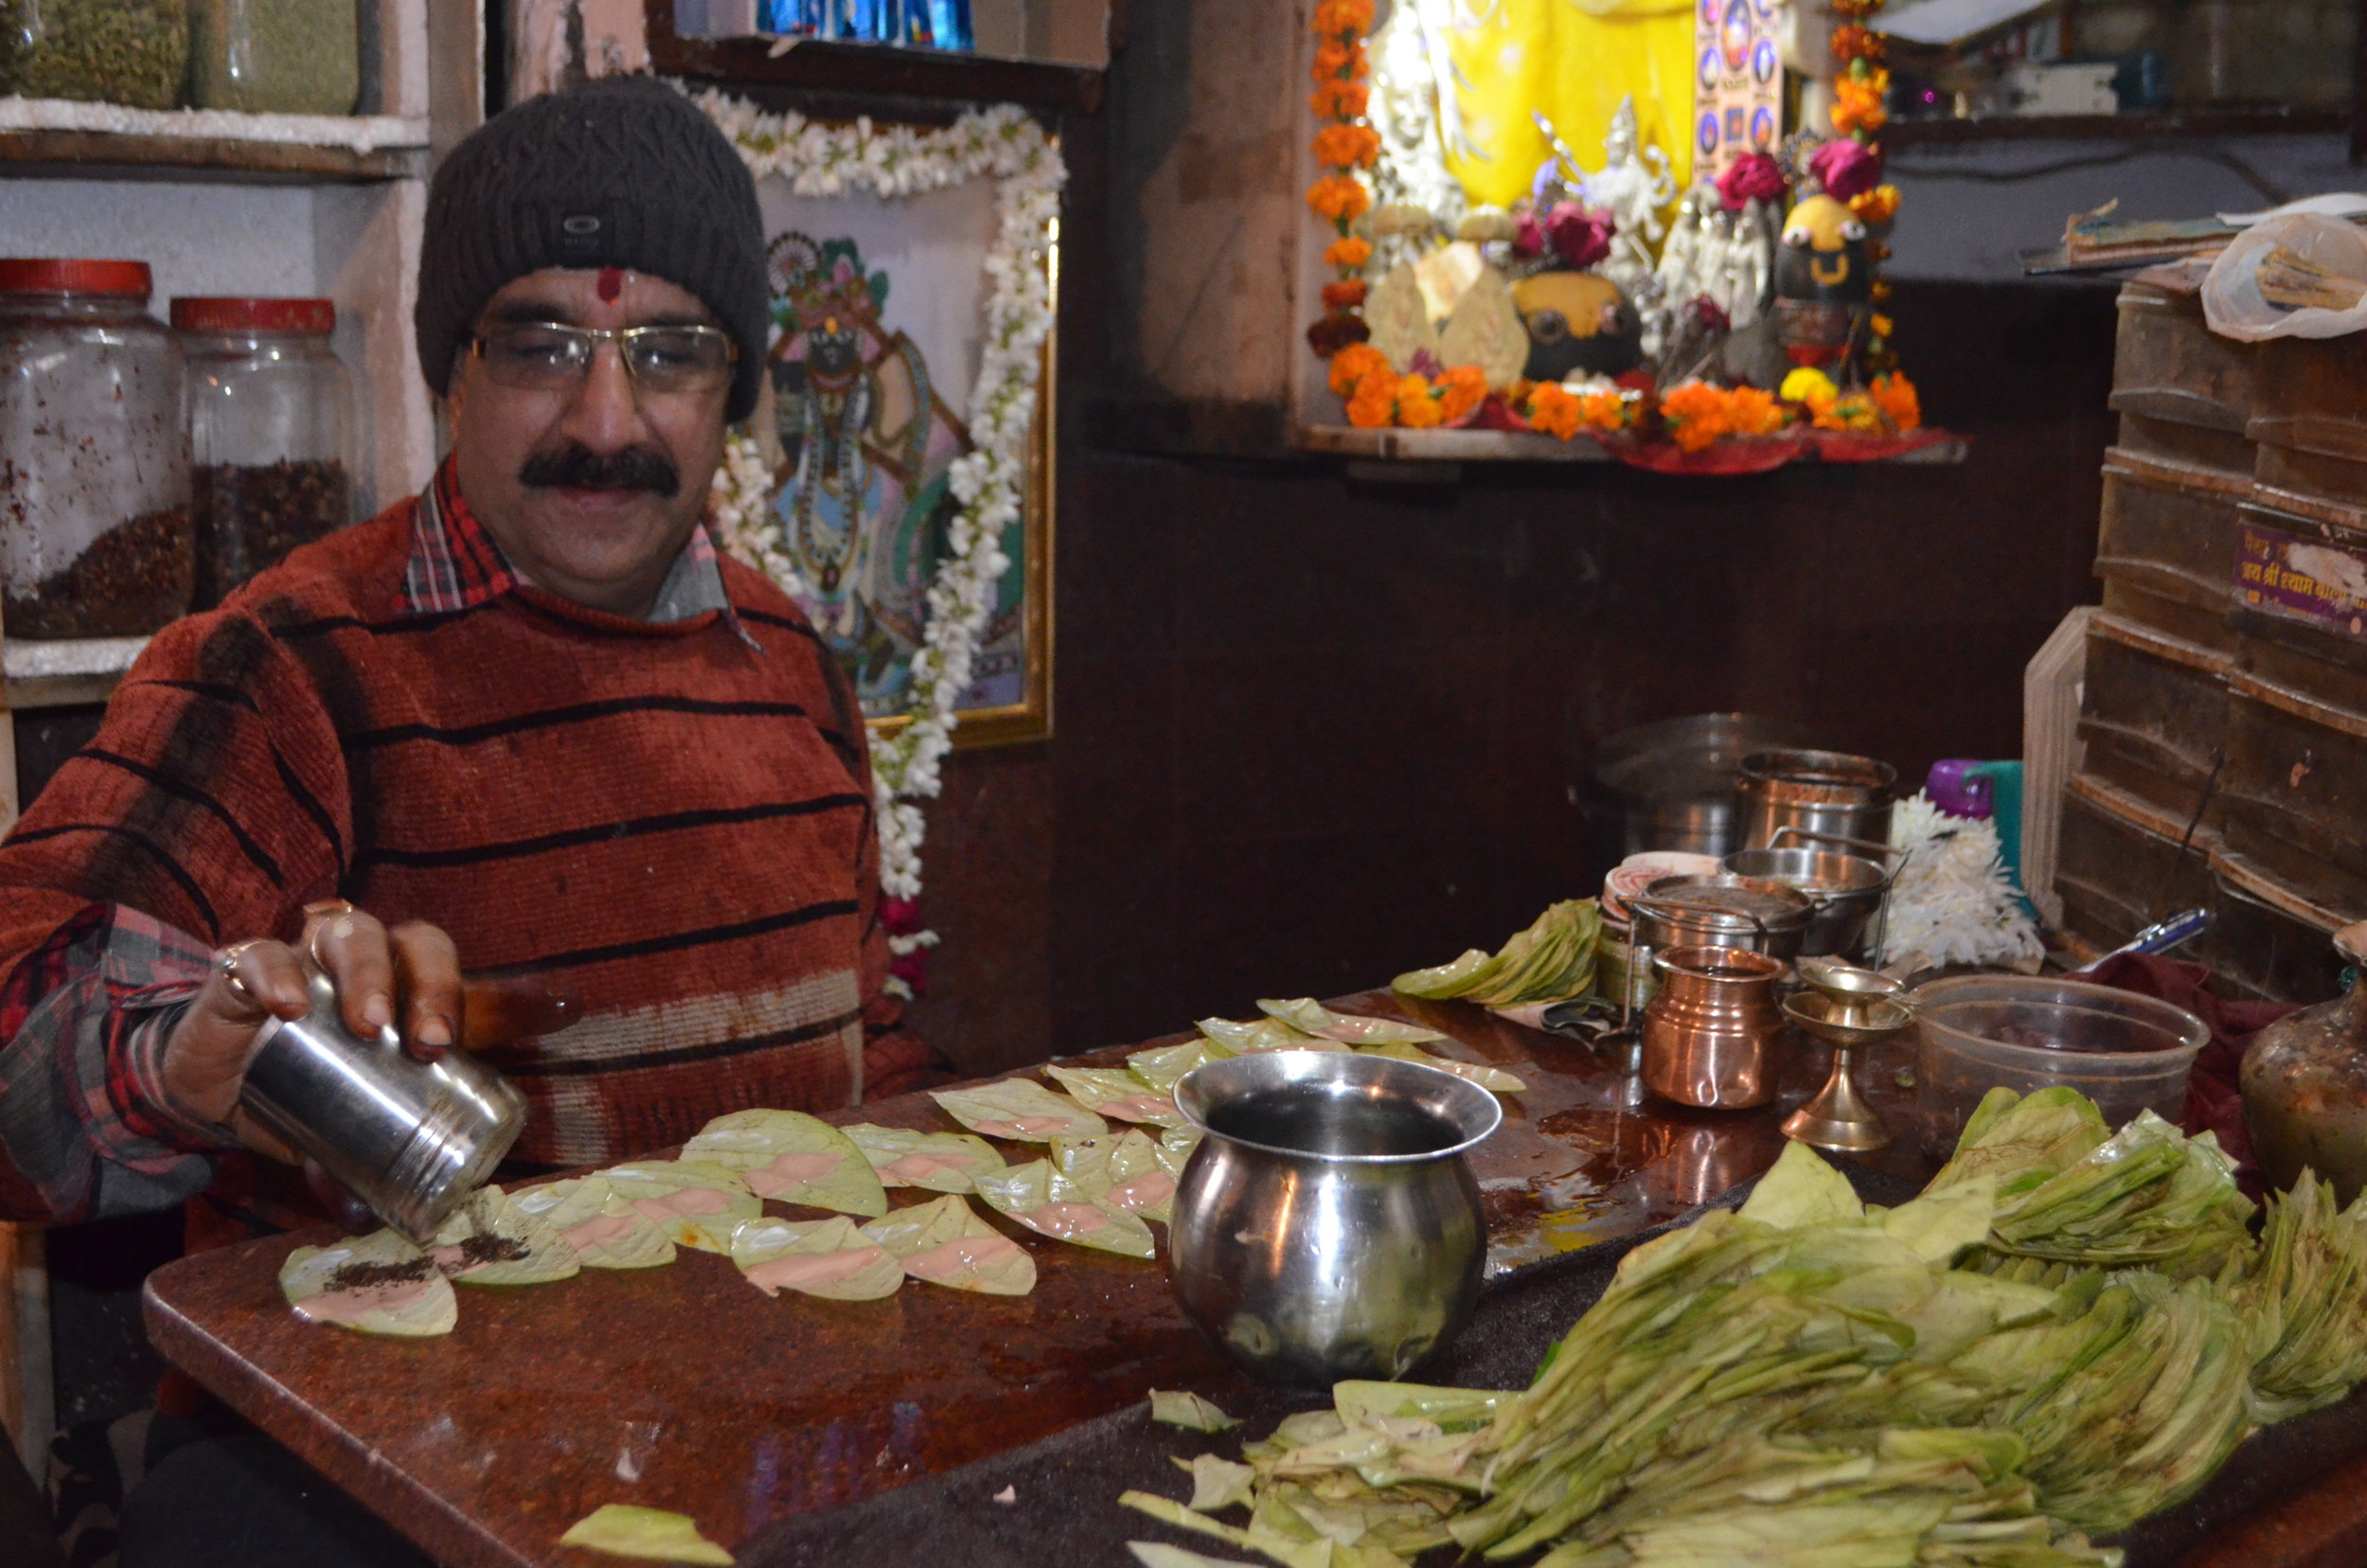 Old Delhi Market Panwalla Beacon Holidays India tours